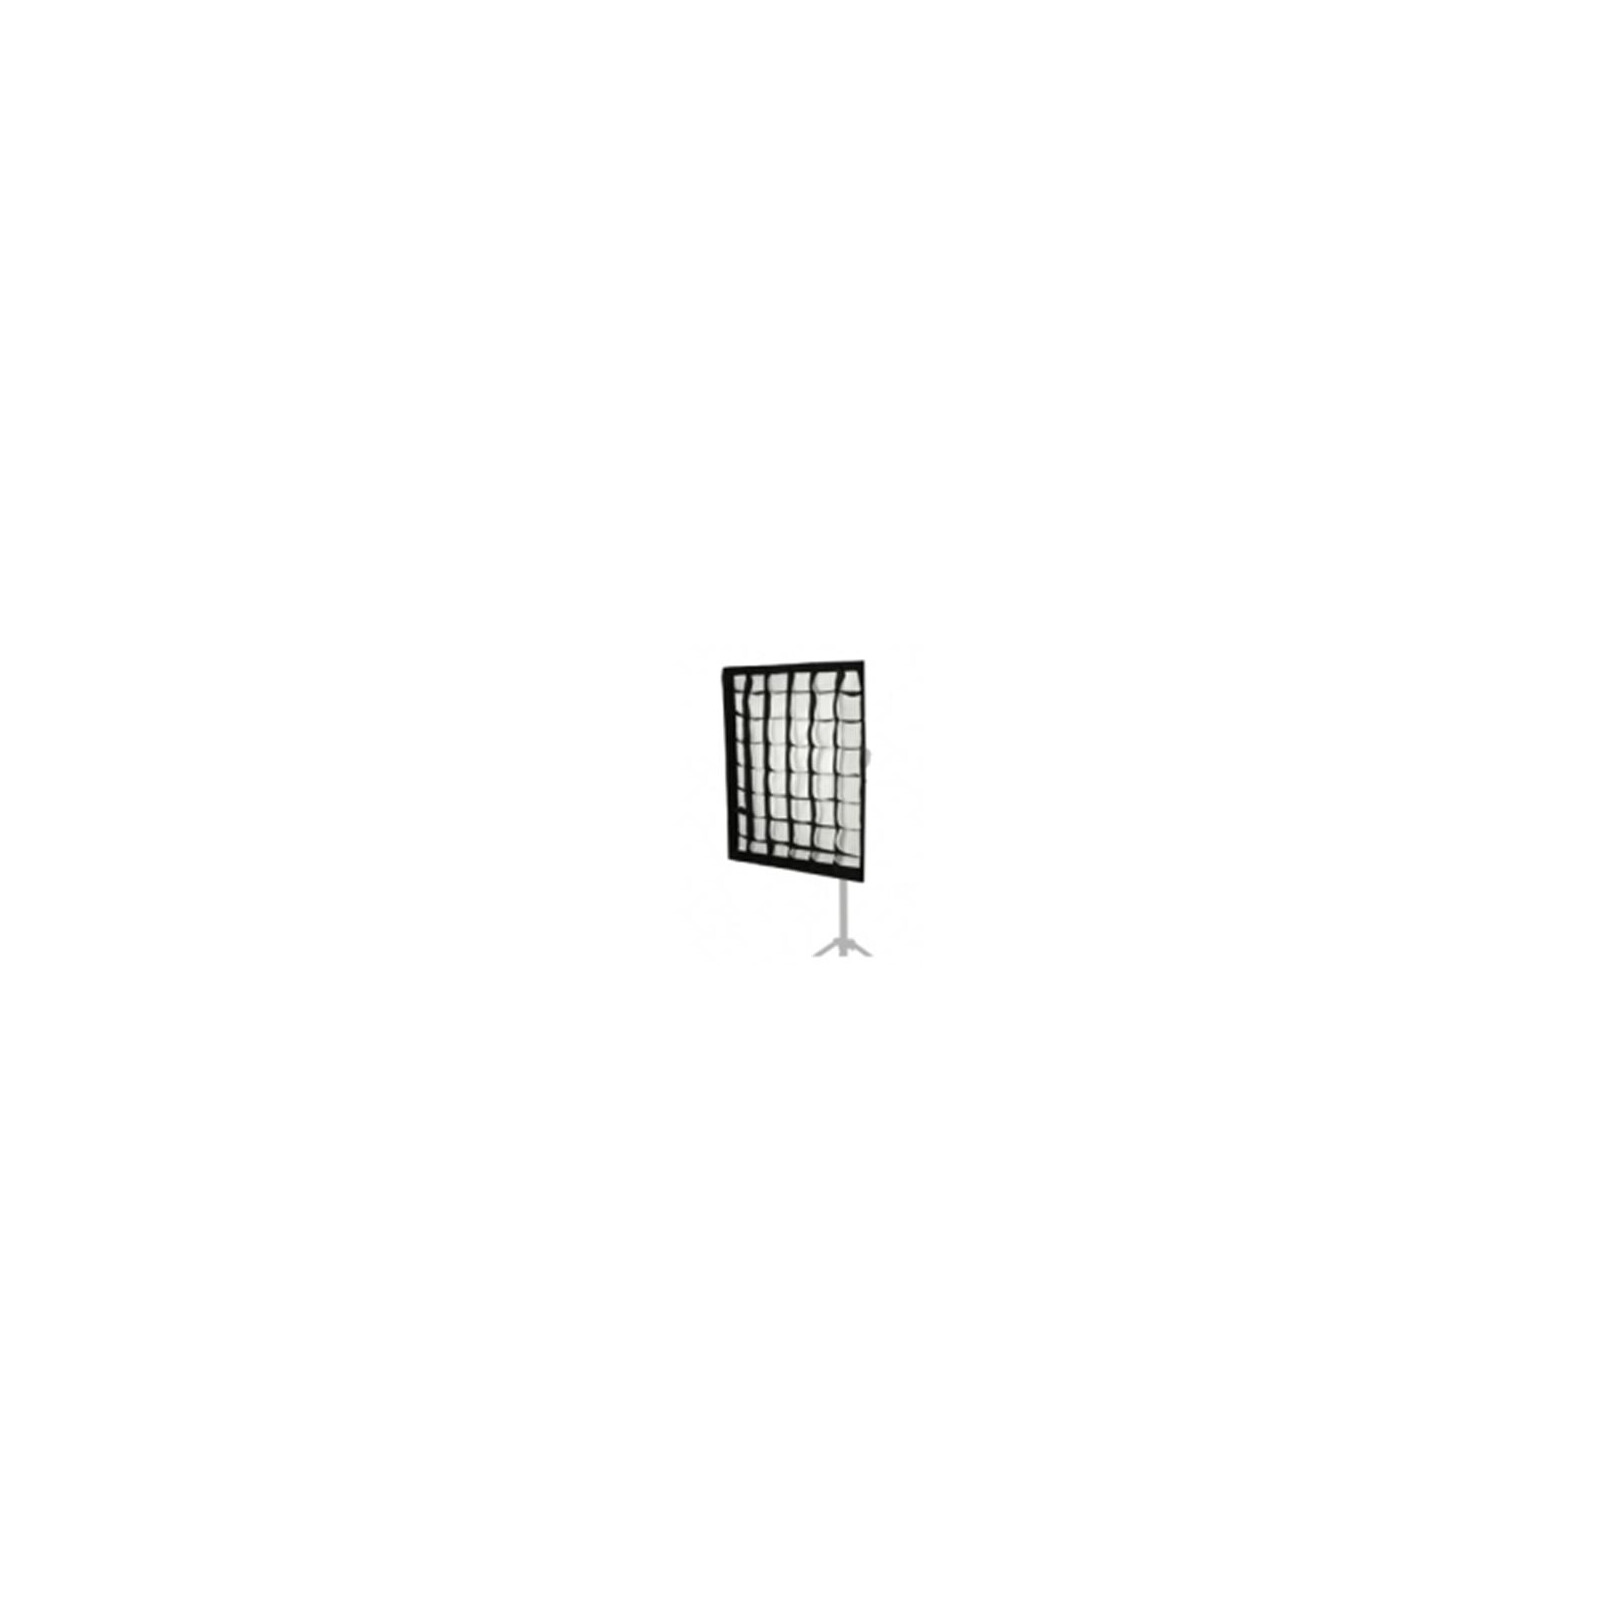 walimex pro Softbox PLUS 60x80cm für Multiblitz P